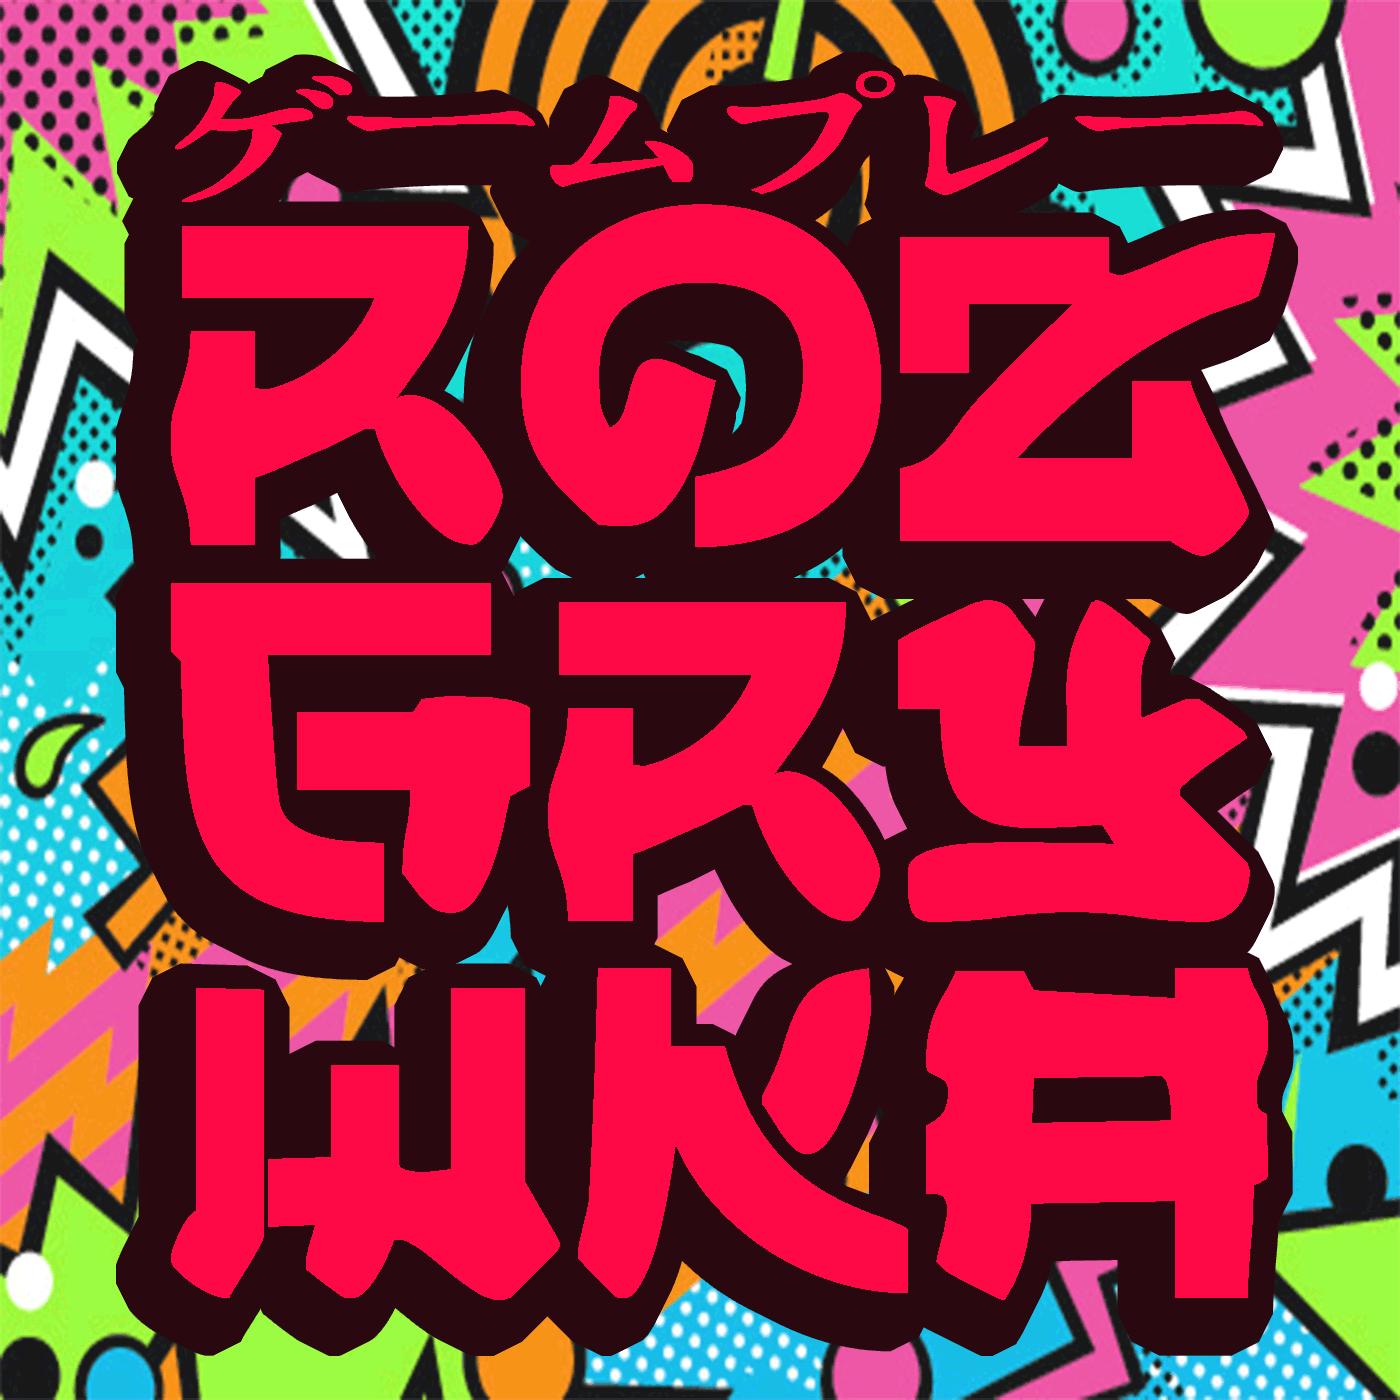 Grube Rozmowy #27 – Hip Hop Hurra